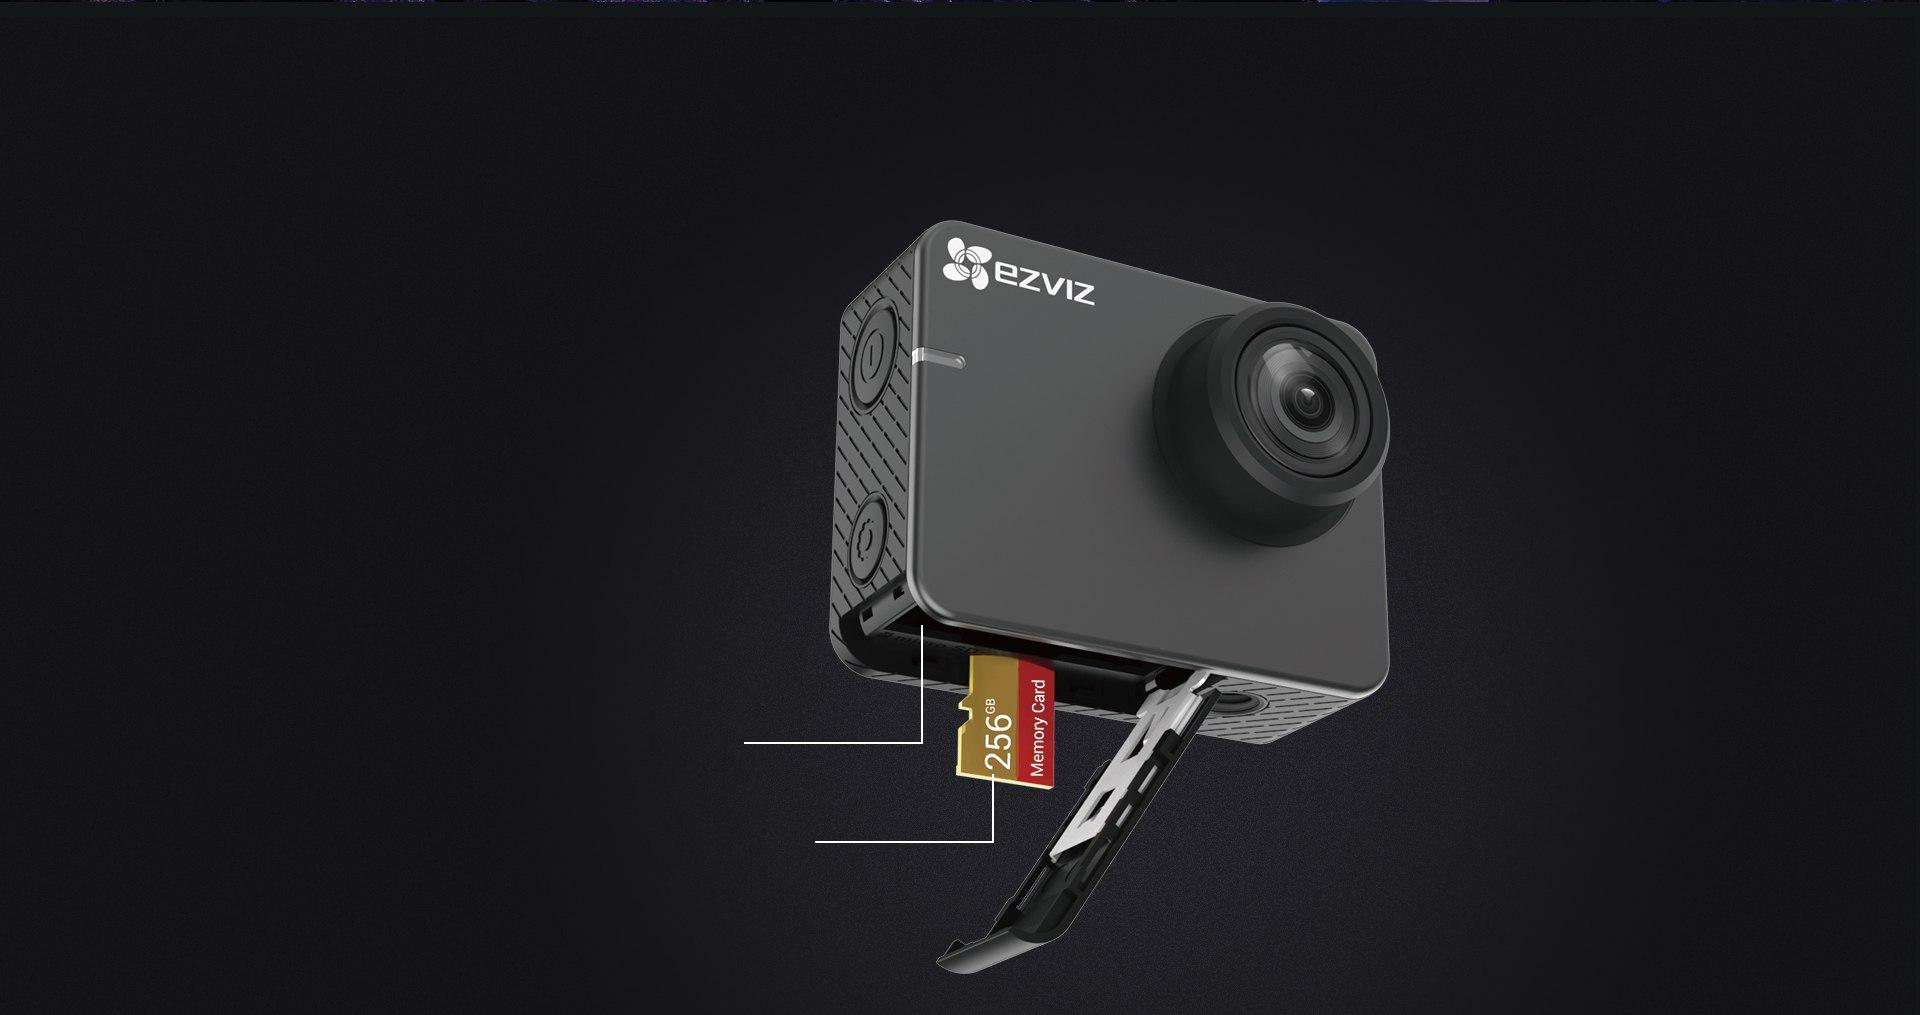 ezviz-kamerka-sd